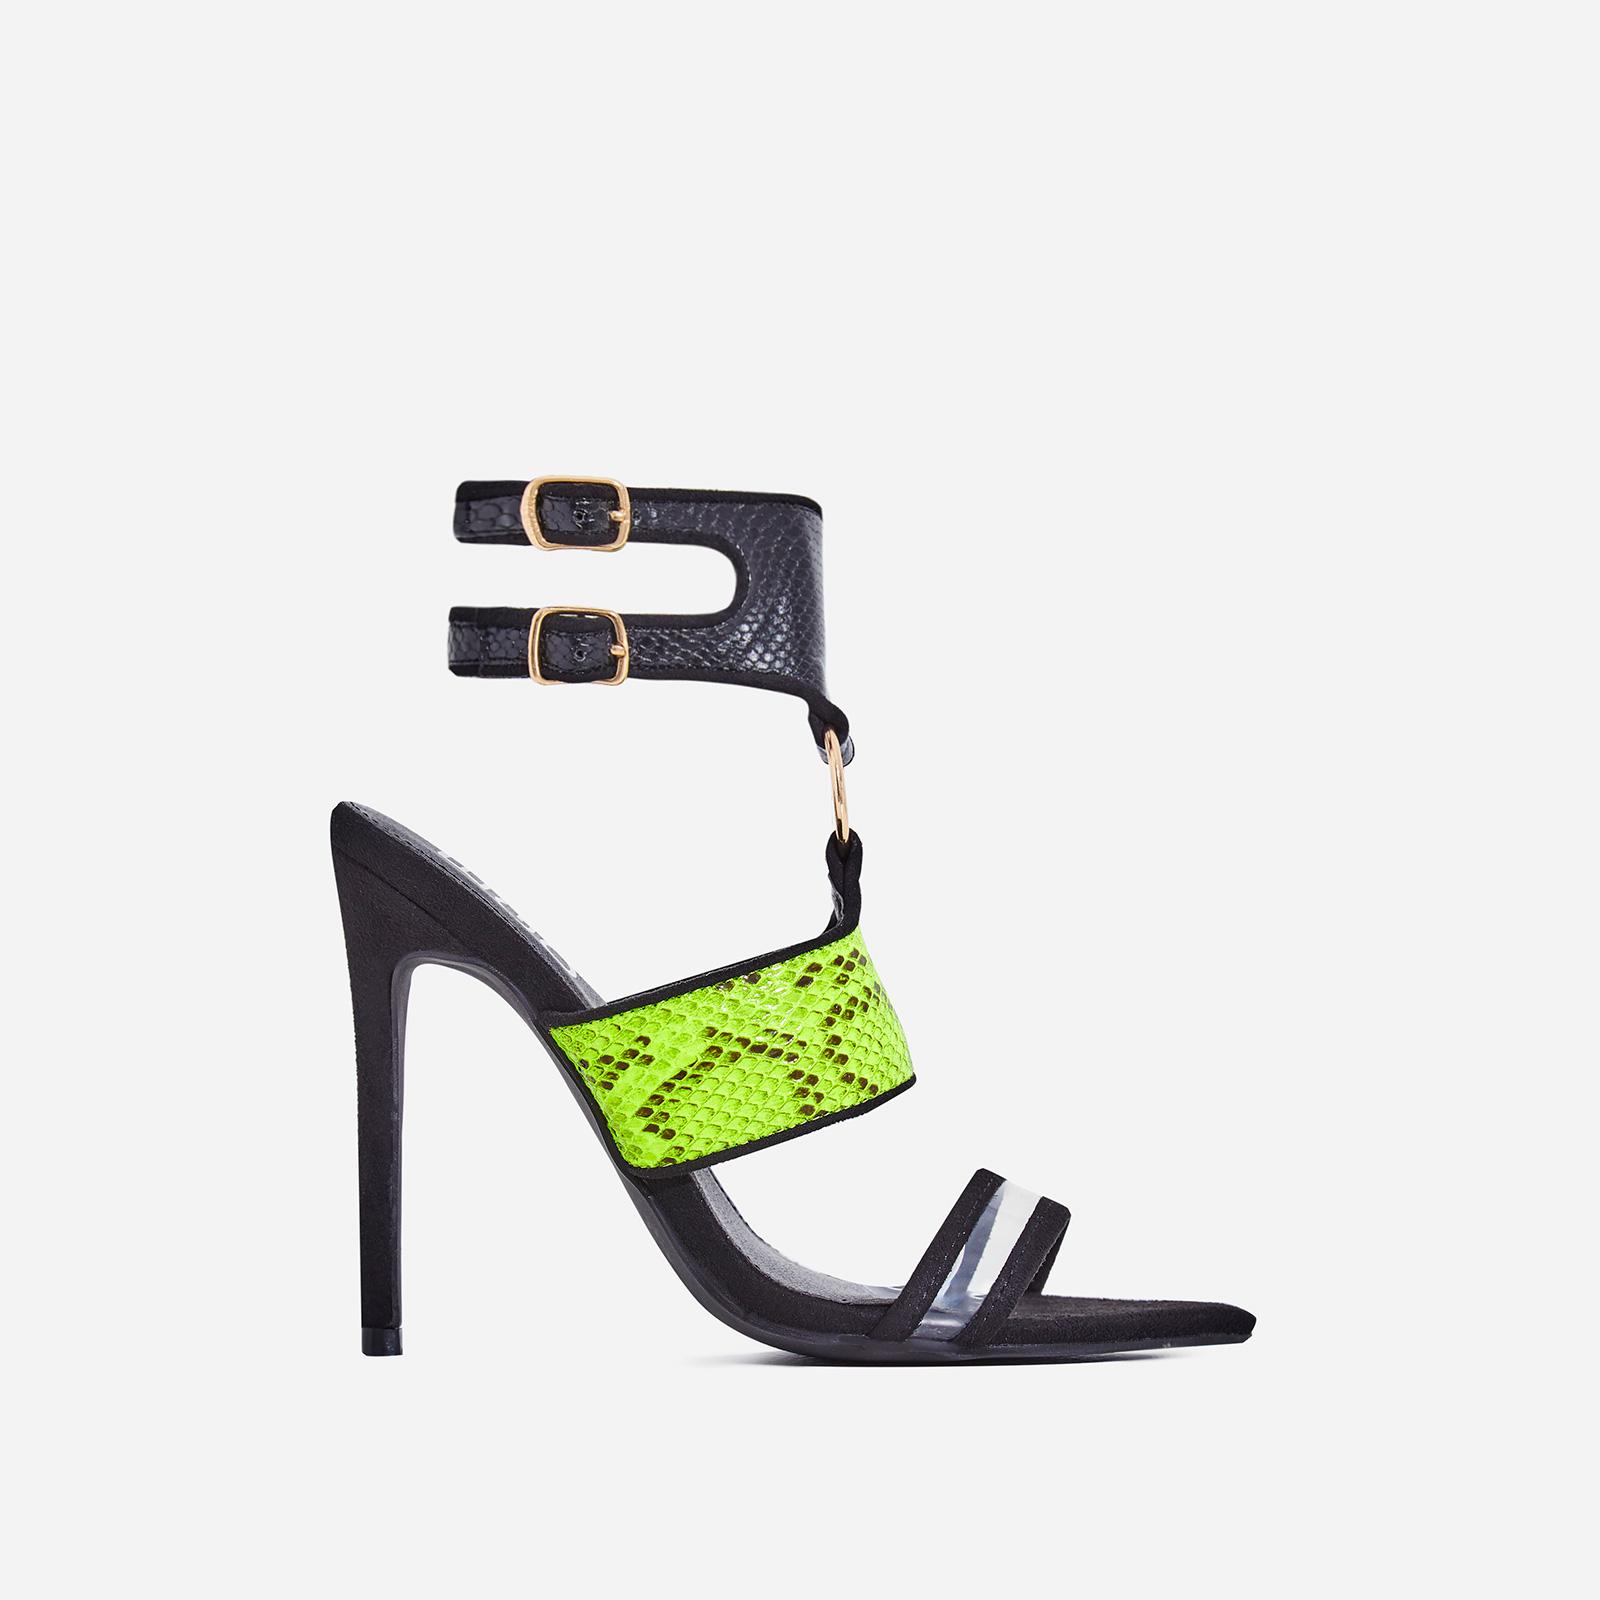 Lex Green Snake Print Perspex Cage Heel In Black Faux Suede